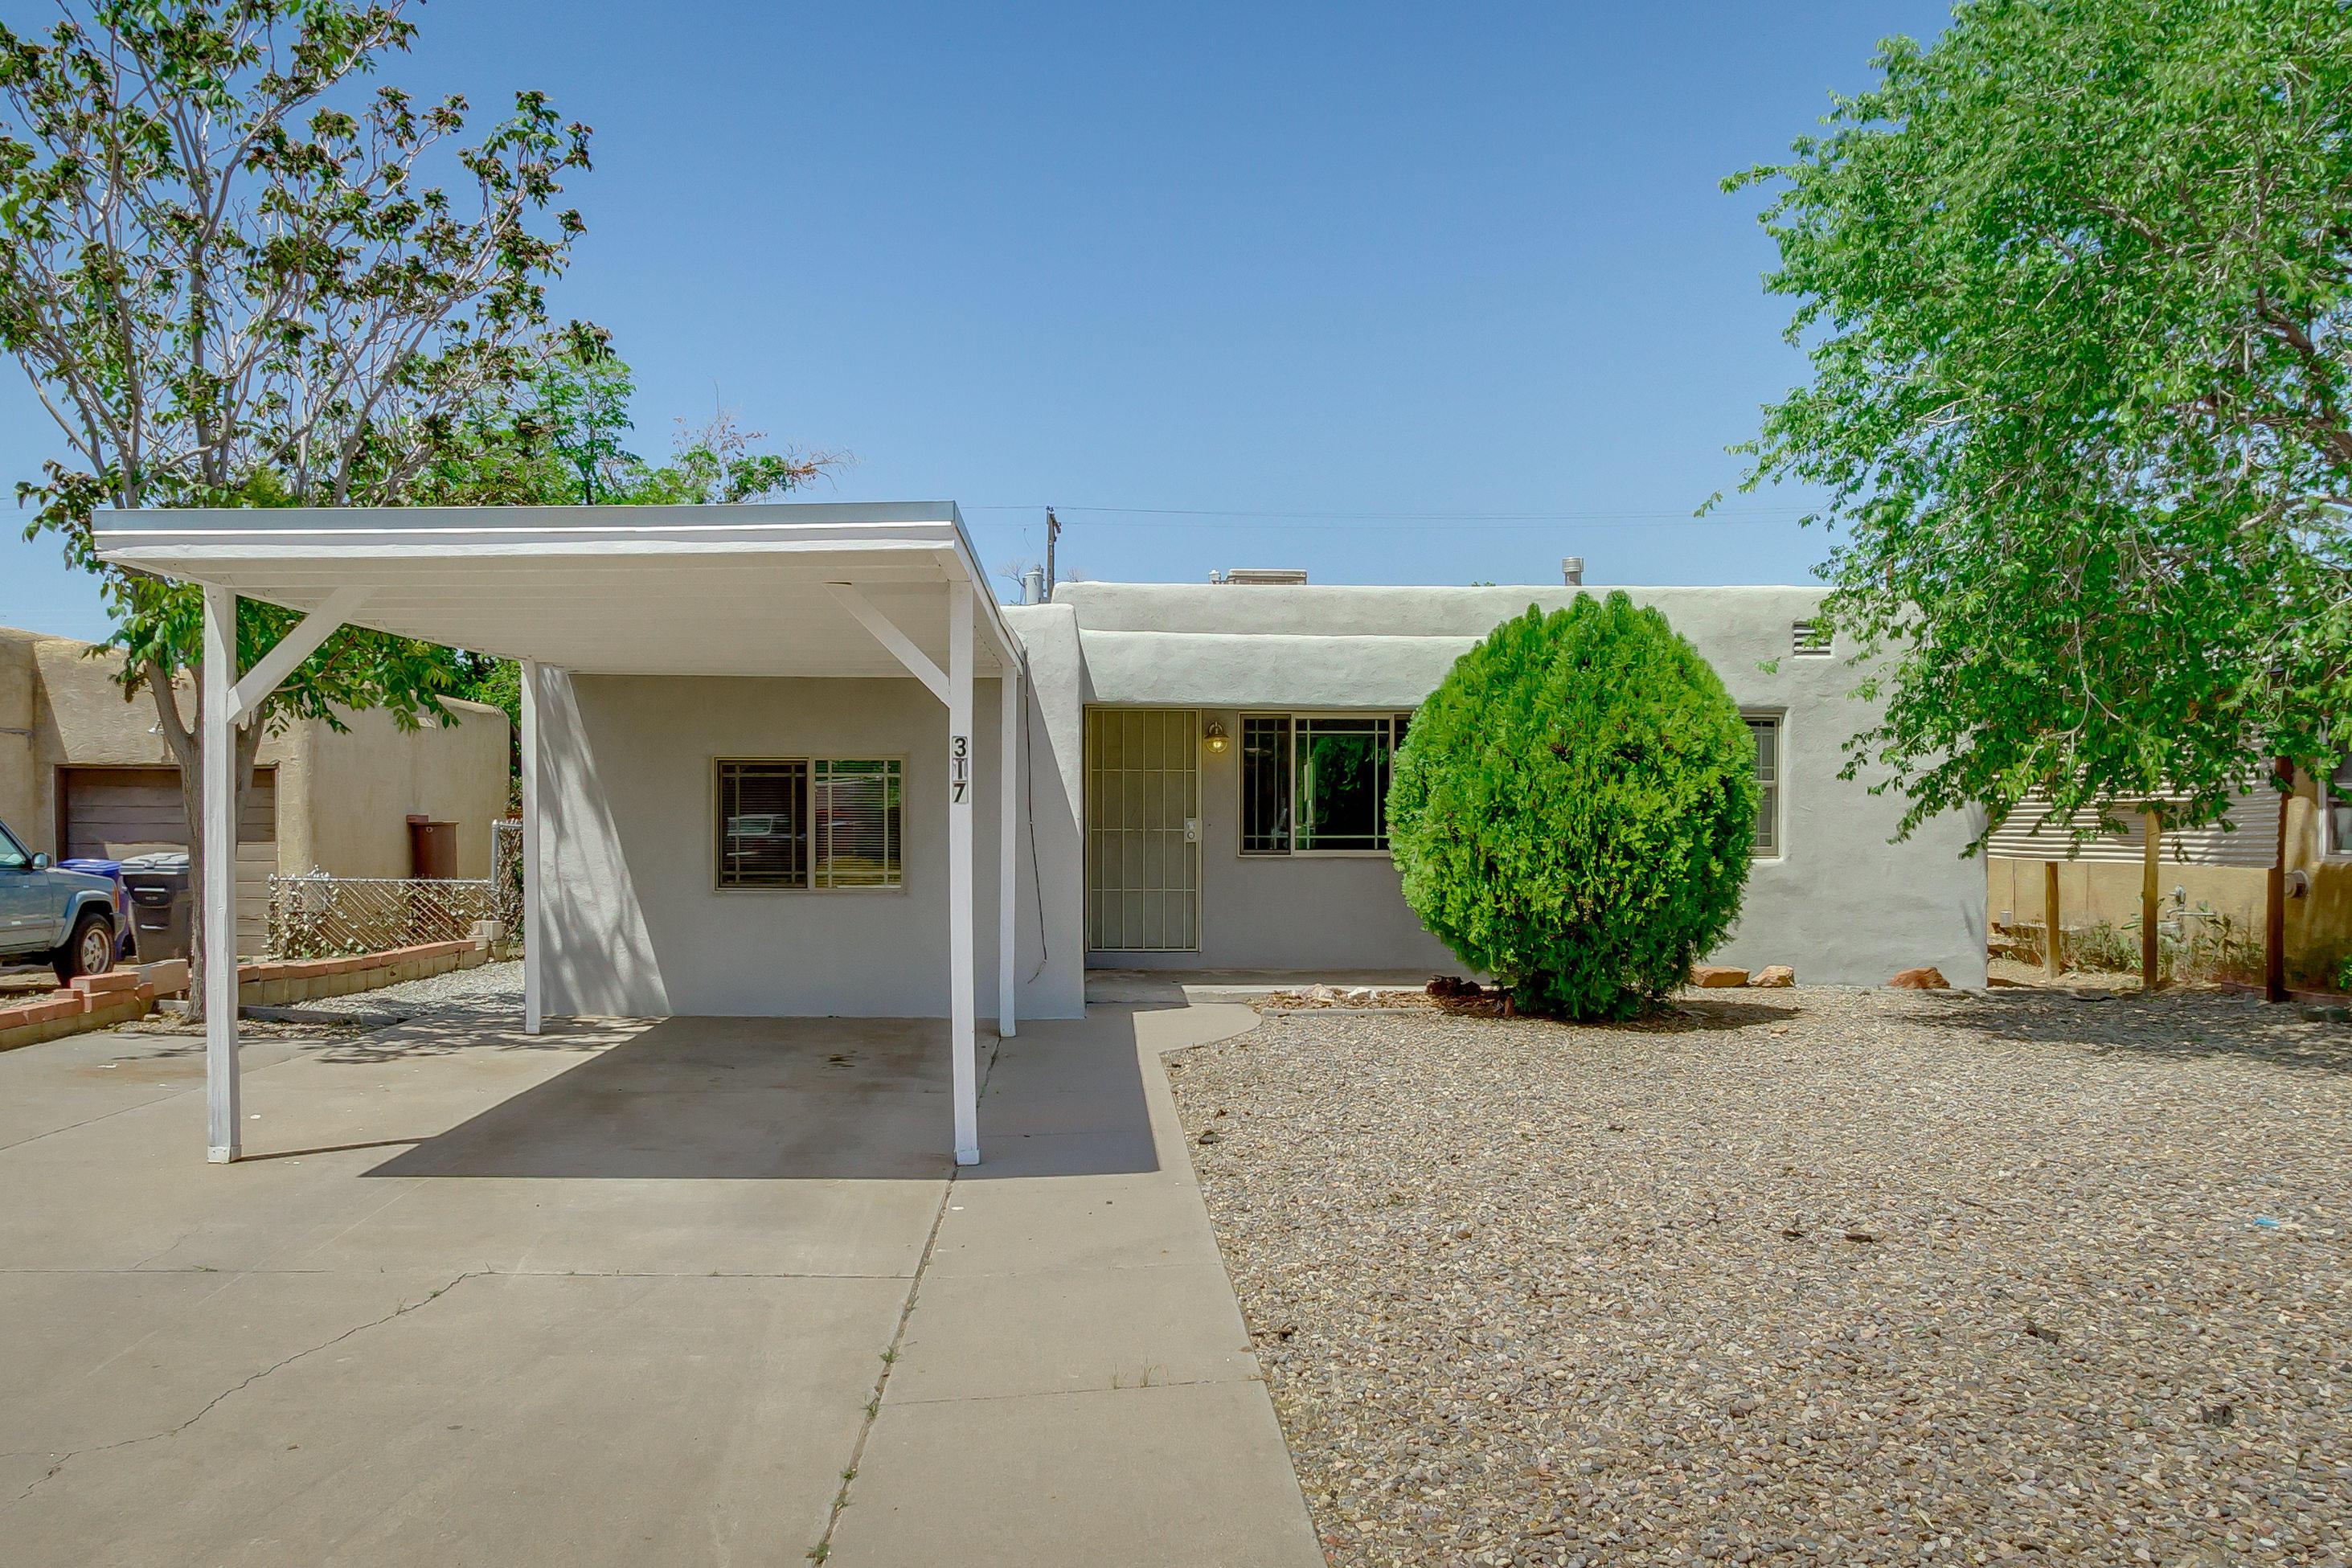 317 ADAMS Street NE Property Photo - Albuquerque, NM real estate listing